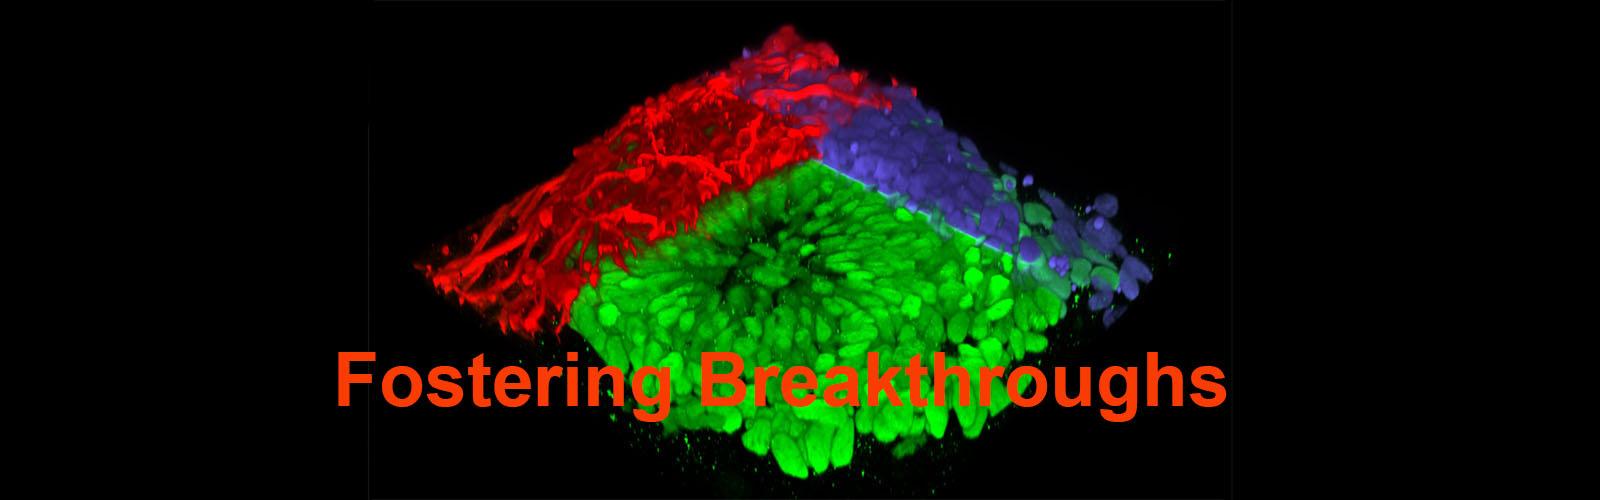 Neural tissue image Fostering Breakthroughs